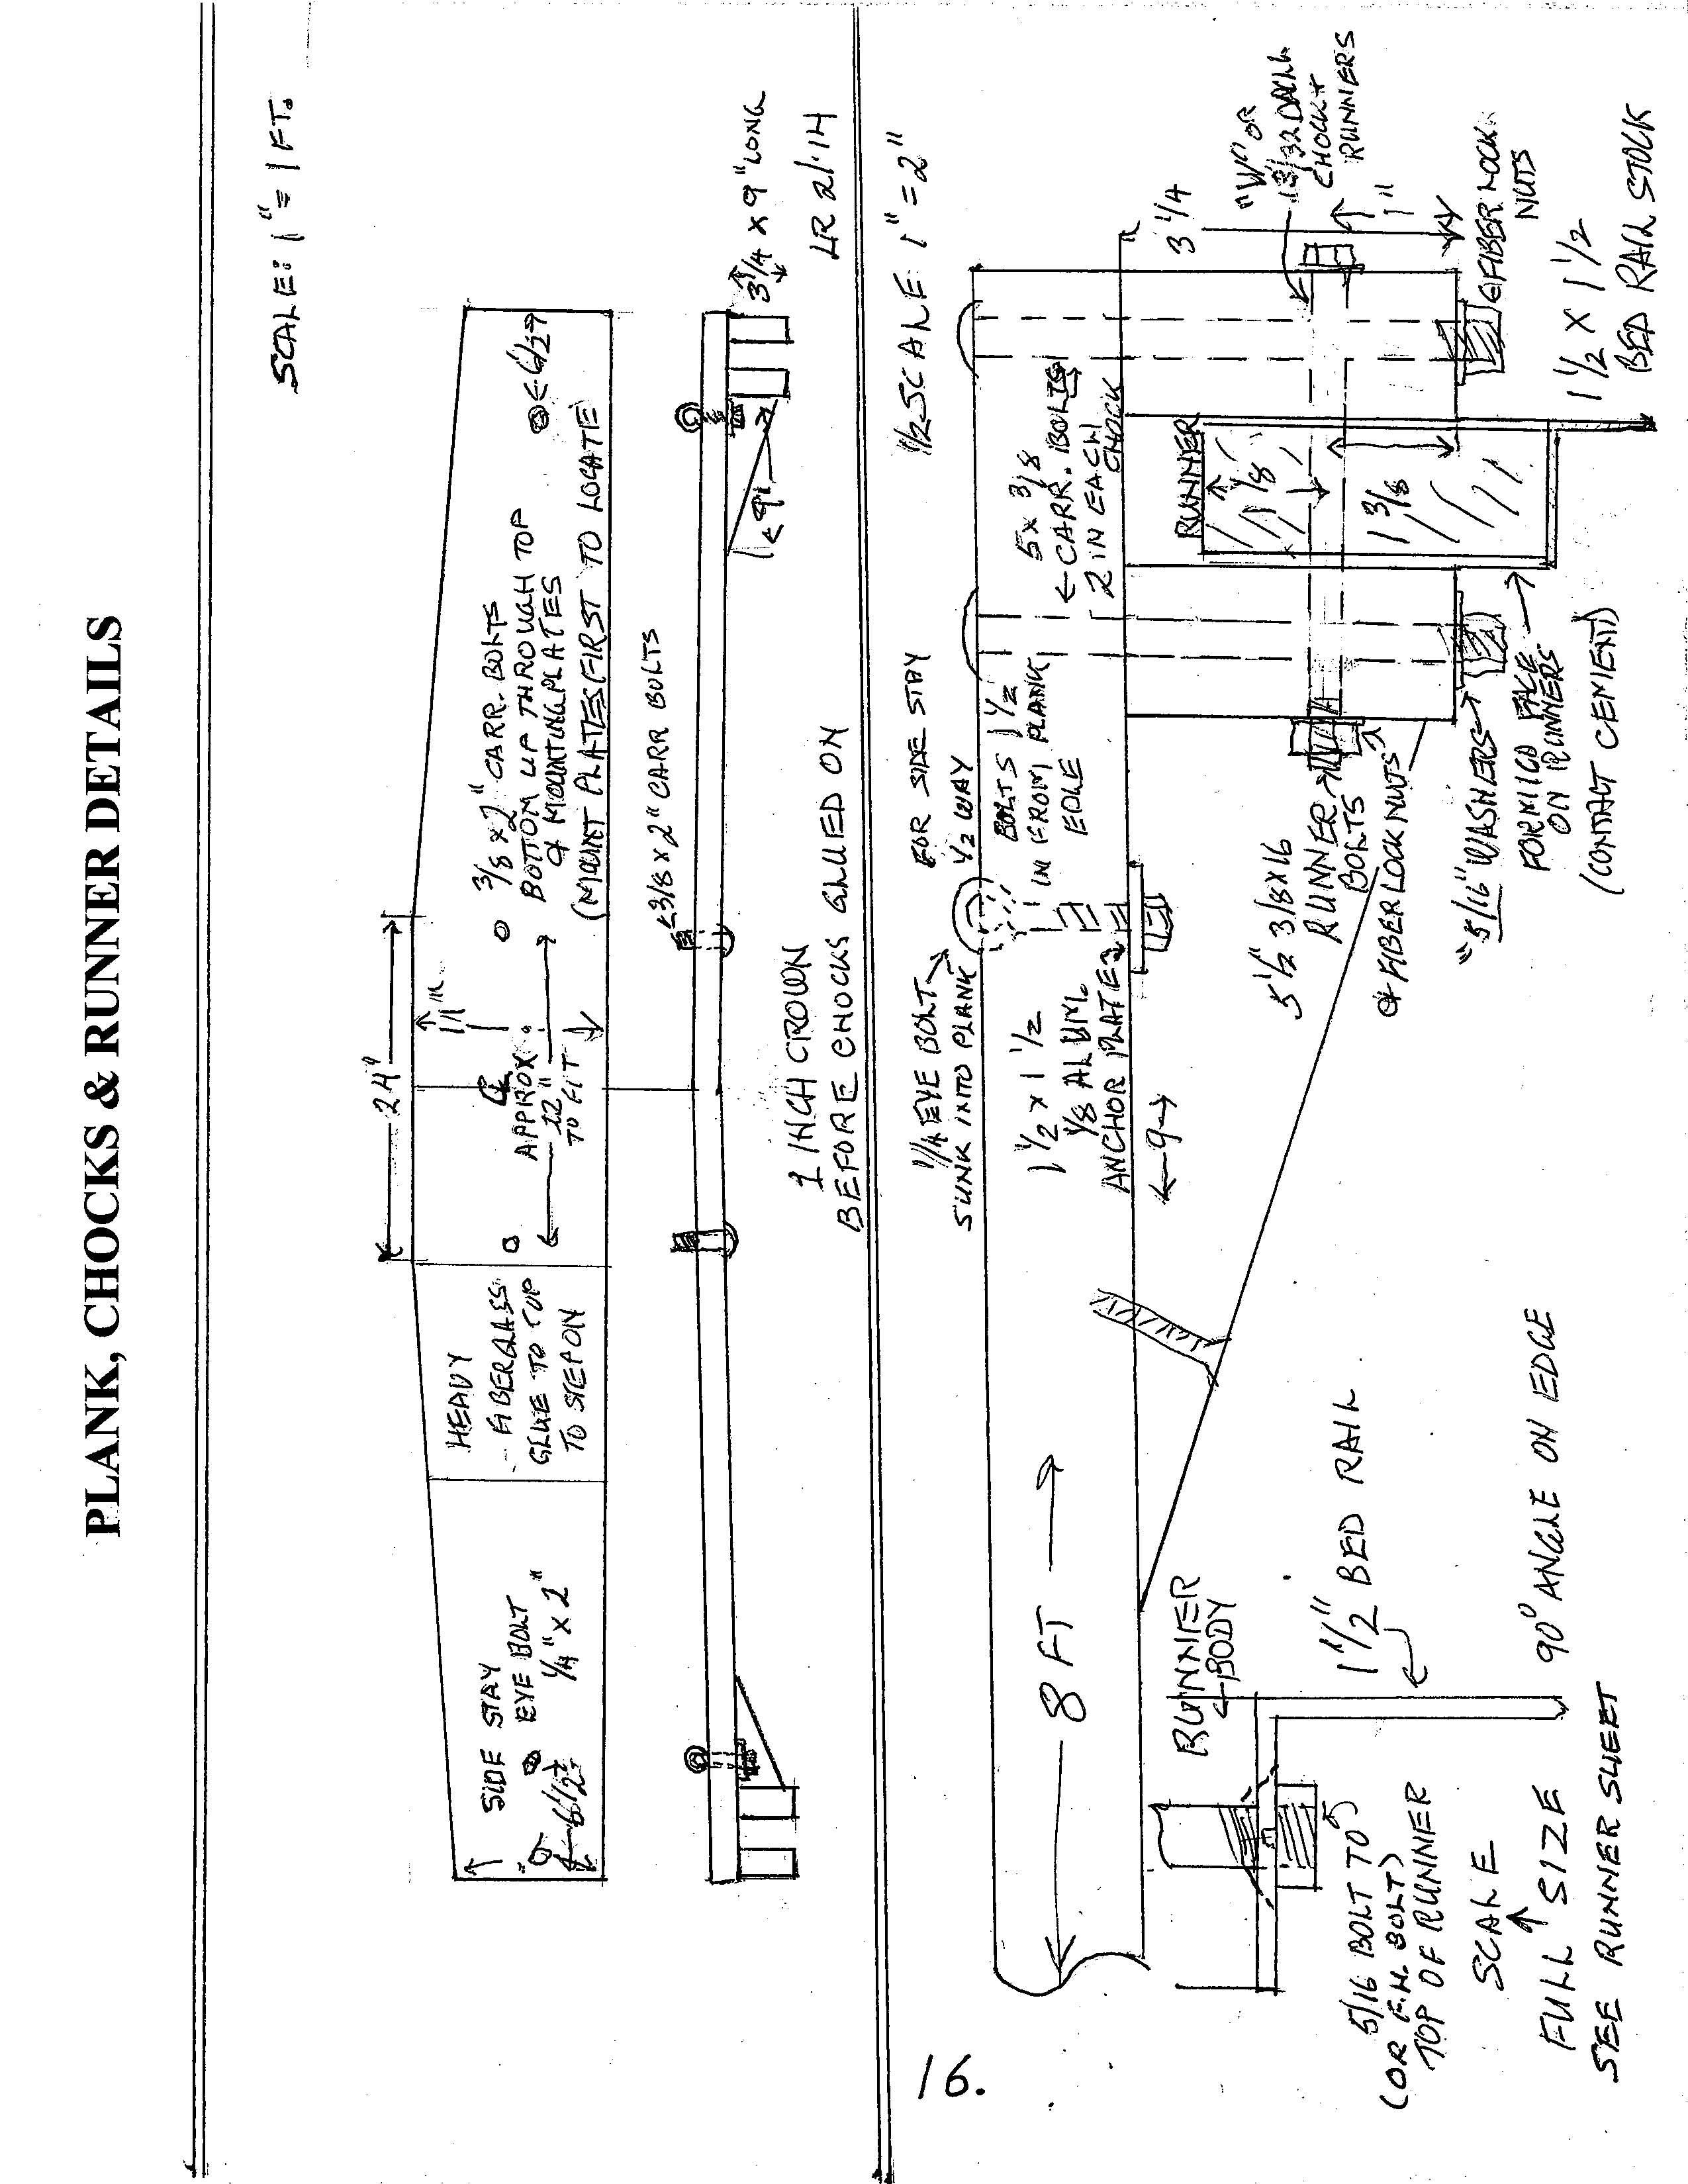 Cheapskate Iceboat The Manual Chickawaukie Ice Boat Club Marine Wiring Diagrams Sailboat Mast Cib Page 16